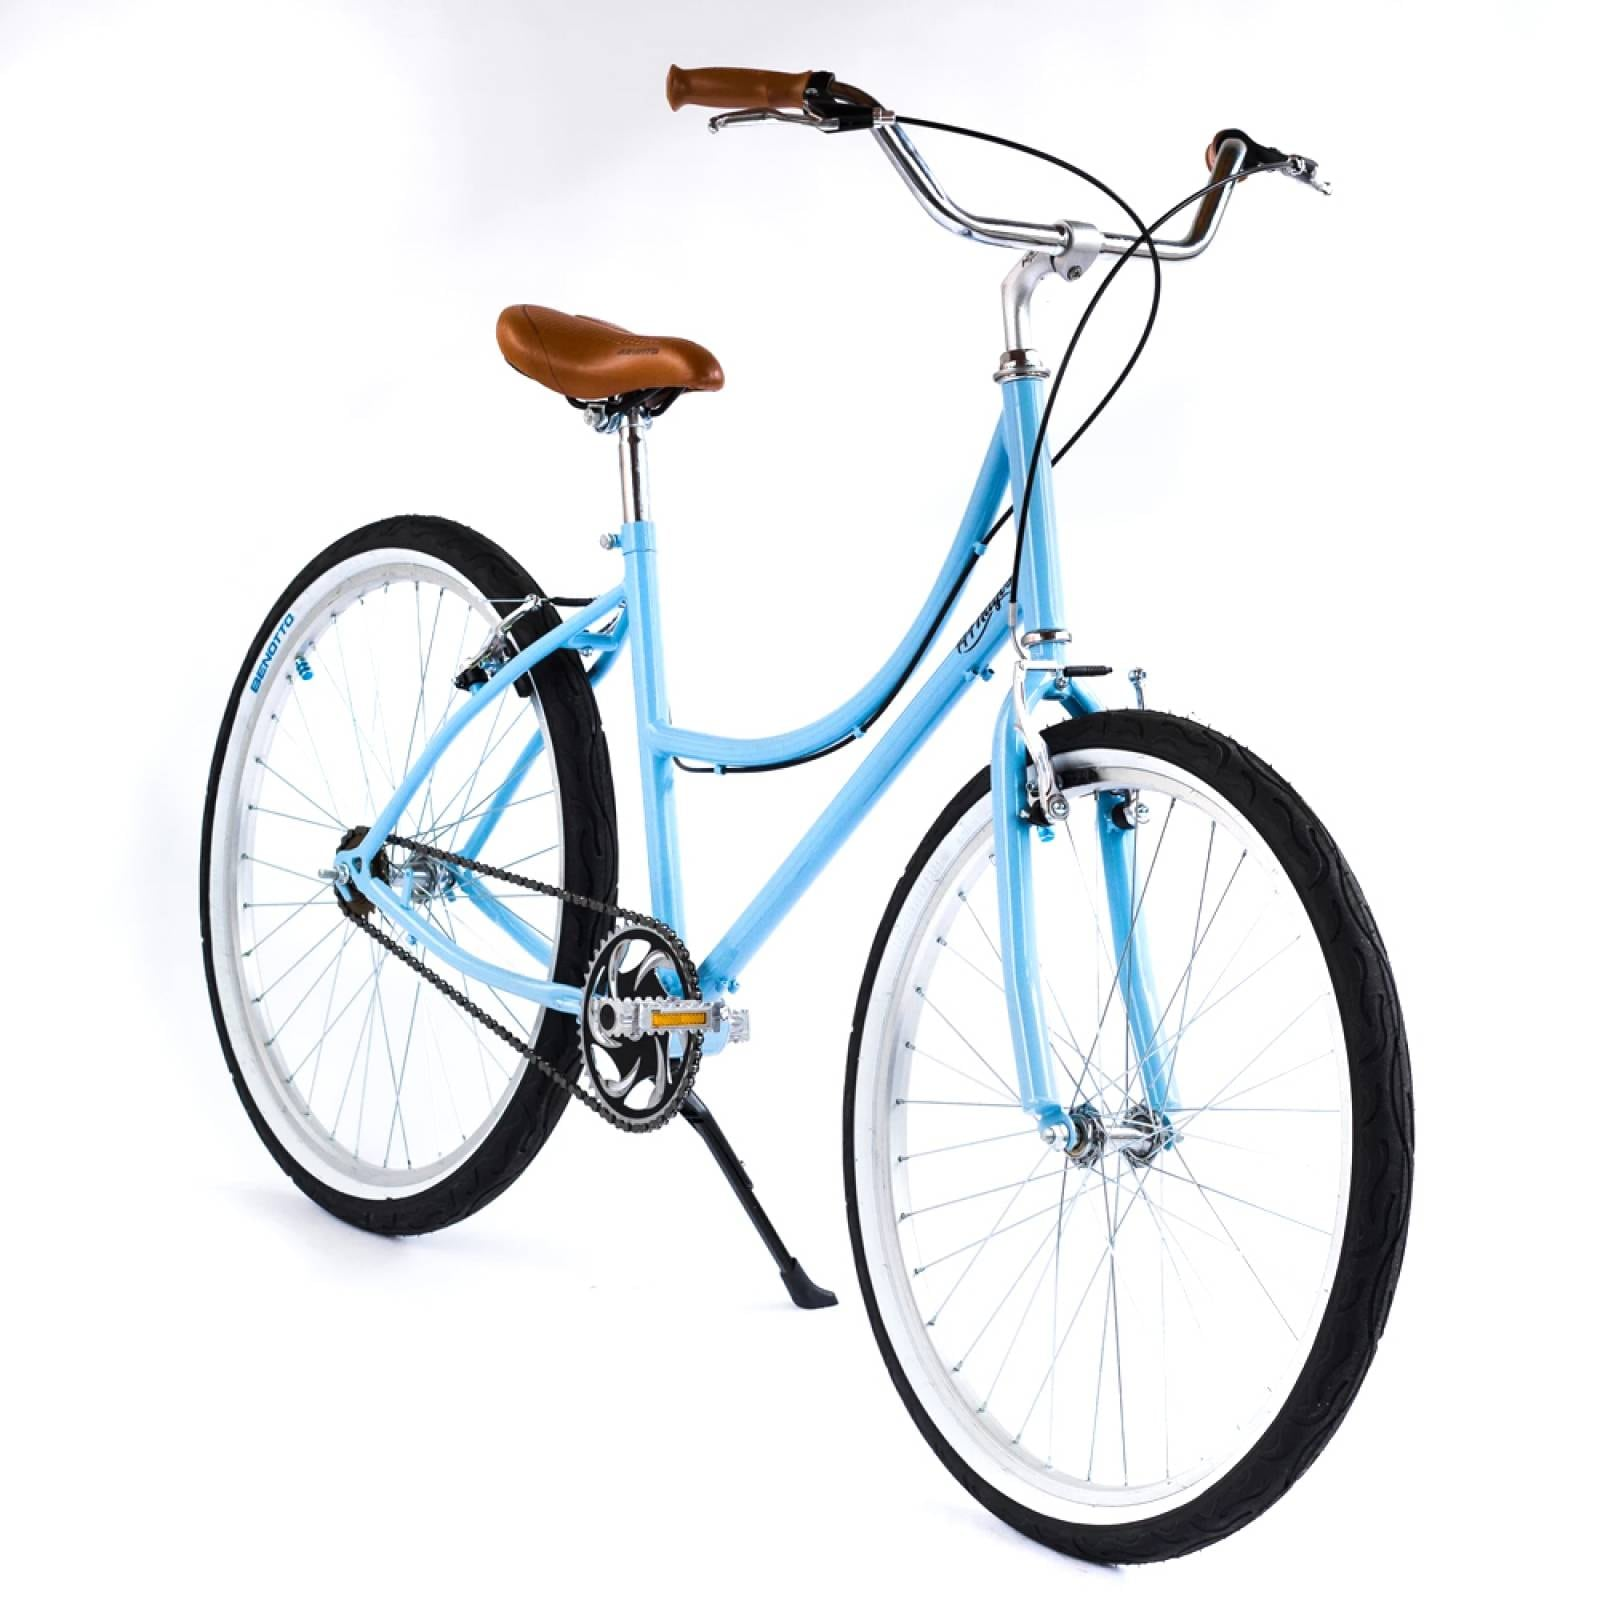 Bicicleta Inglesa Rodada 26 Cuadro Acero Reflejante 144 Rayos Bikes